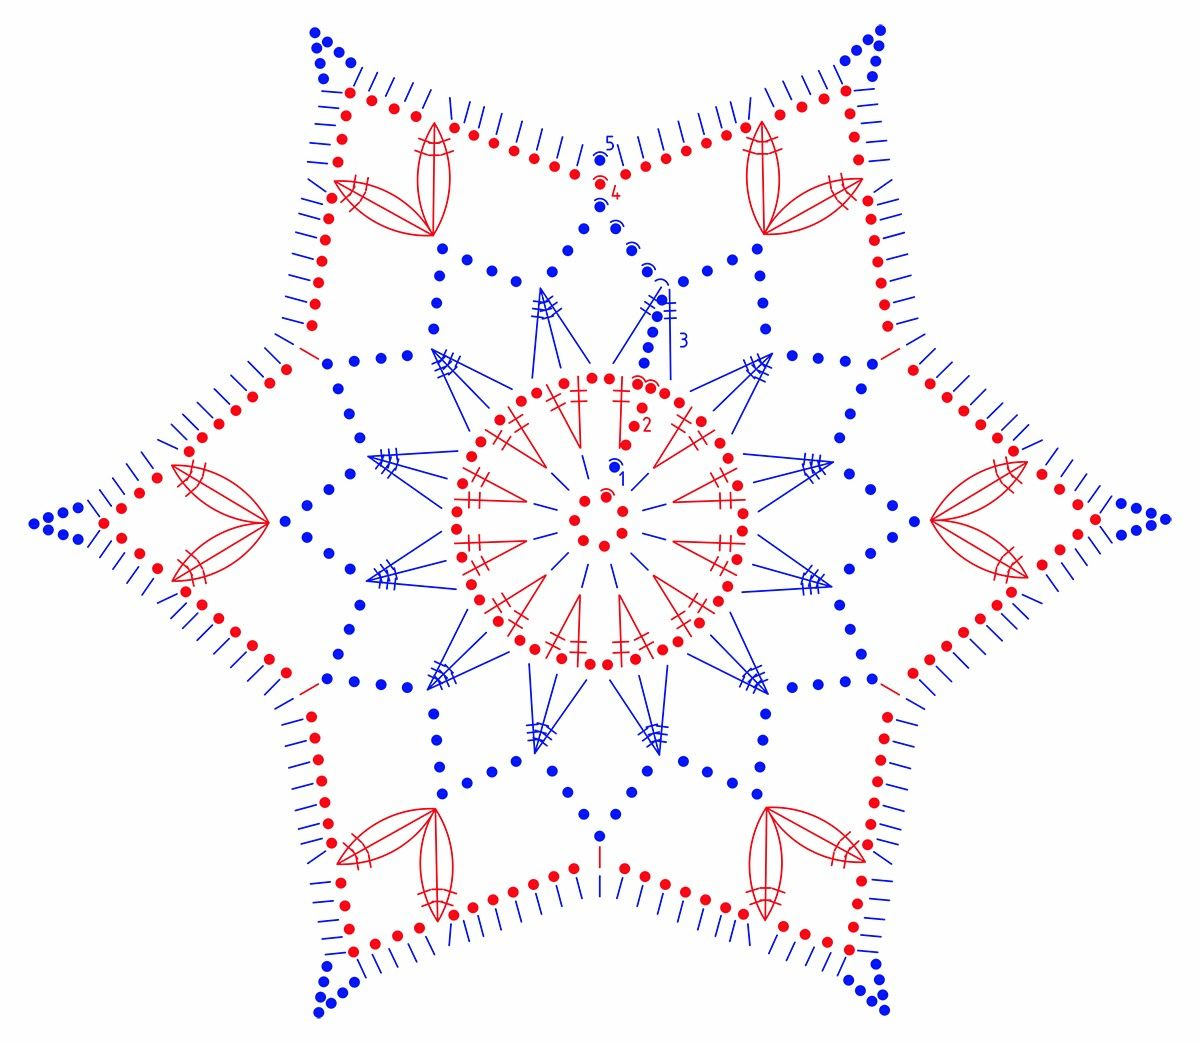 crochet snowflake h kelsterne und schneeflocken. Black Bedroom Furniture Sets. Home Design Ideas